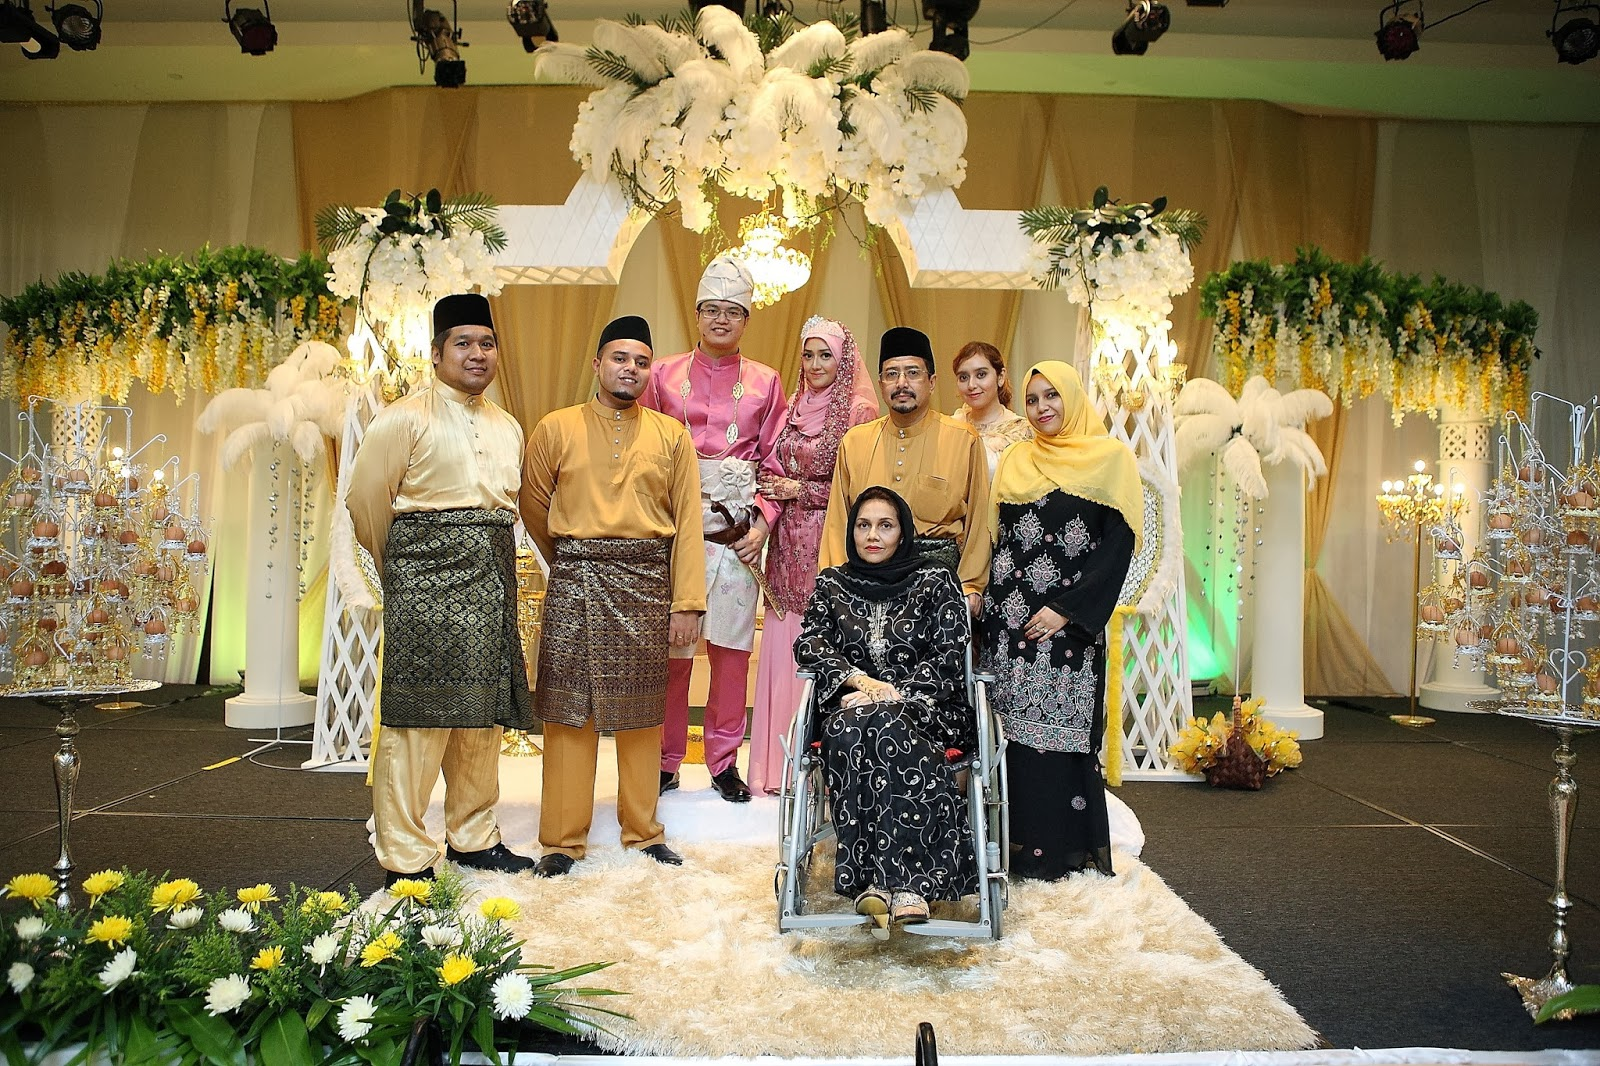 wedding-reception-shedazzles